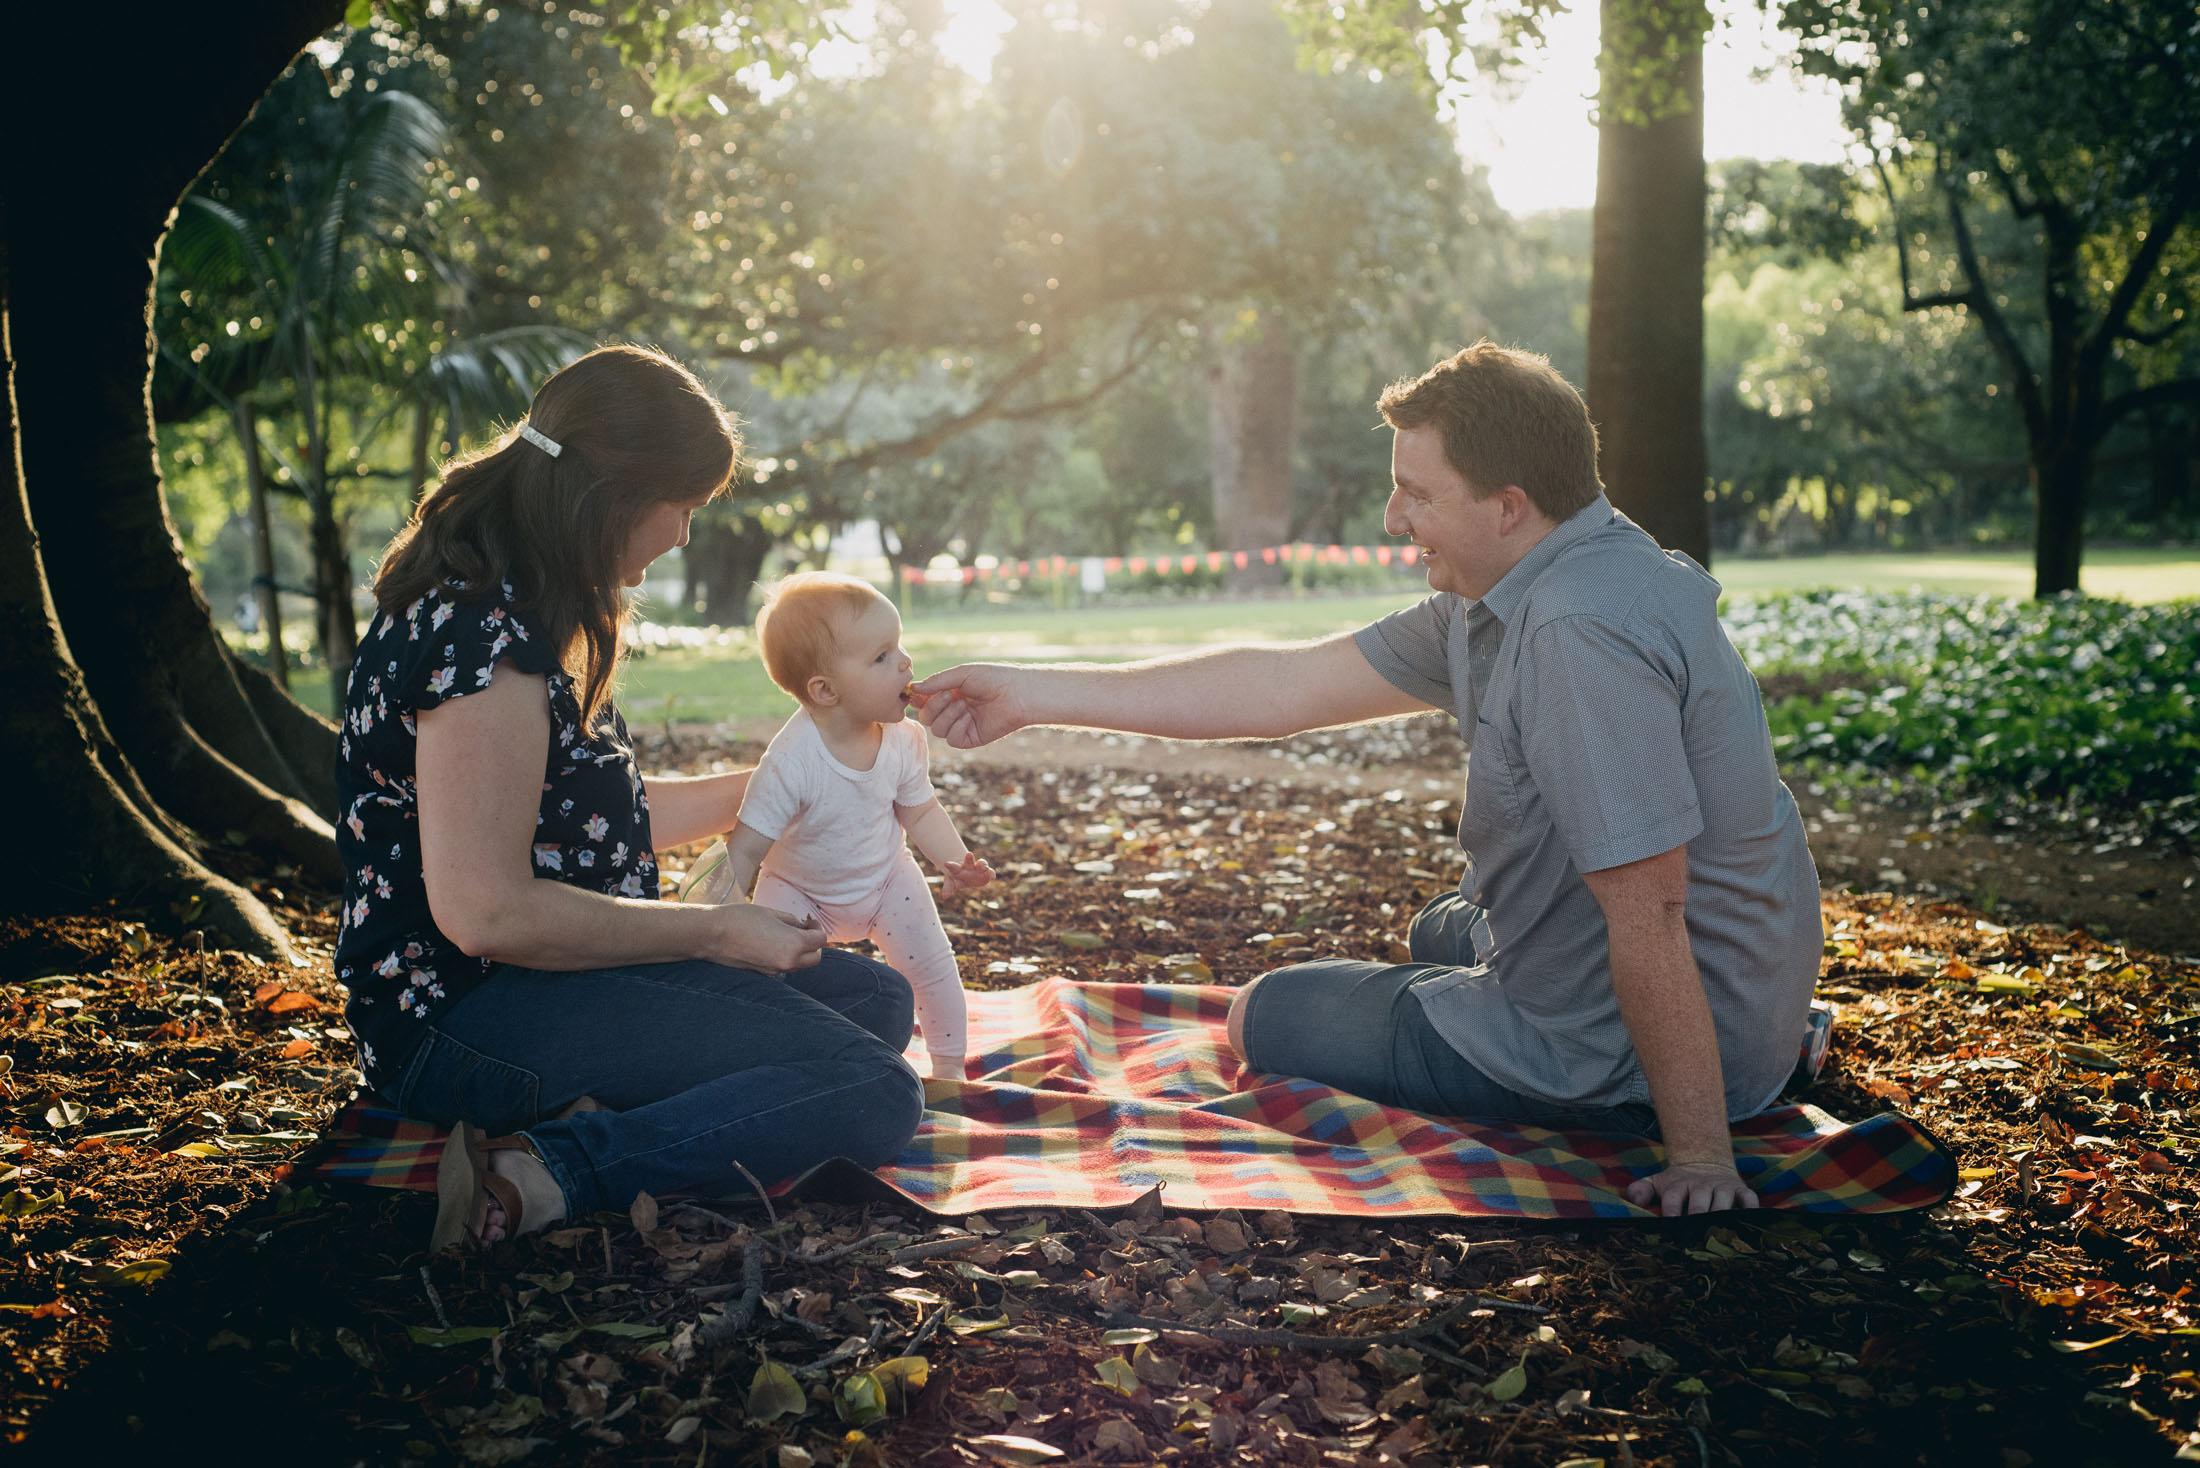 Allen_Family-Photography-unposed17.JPG